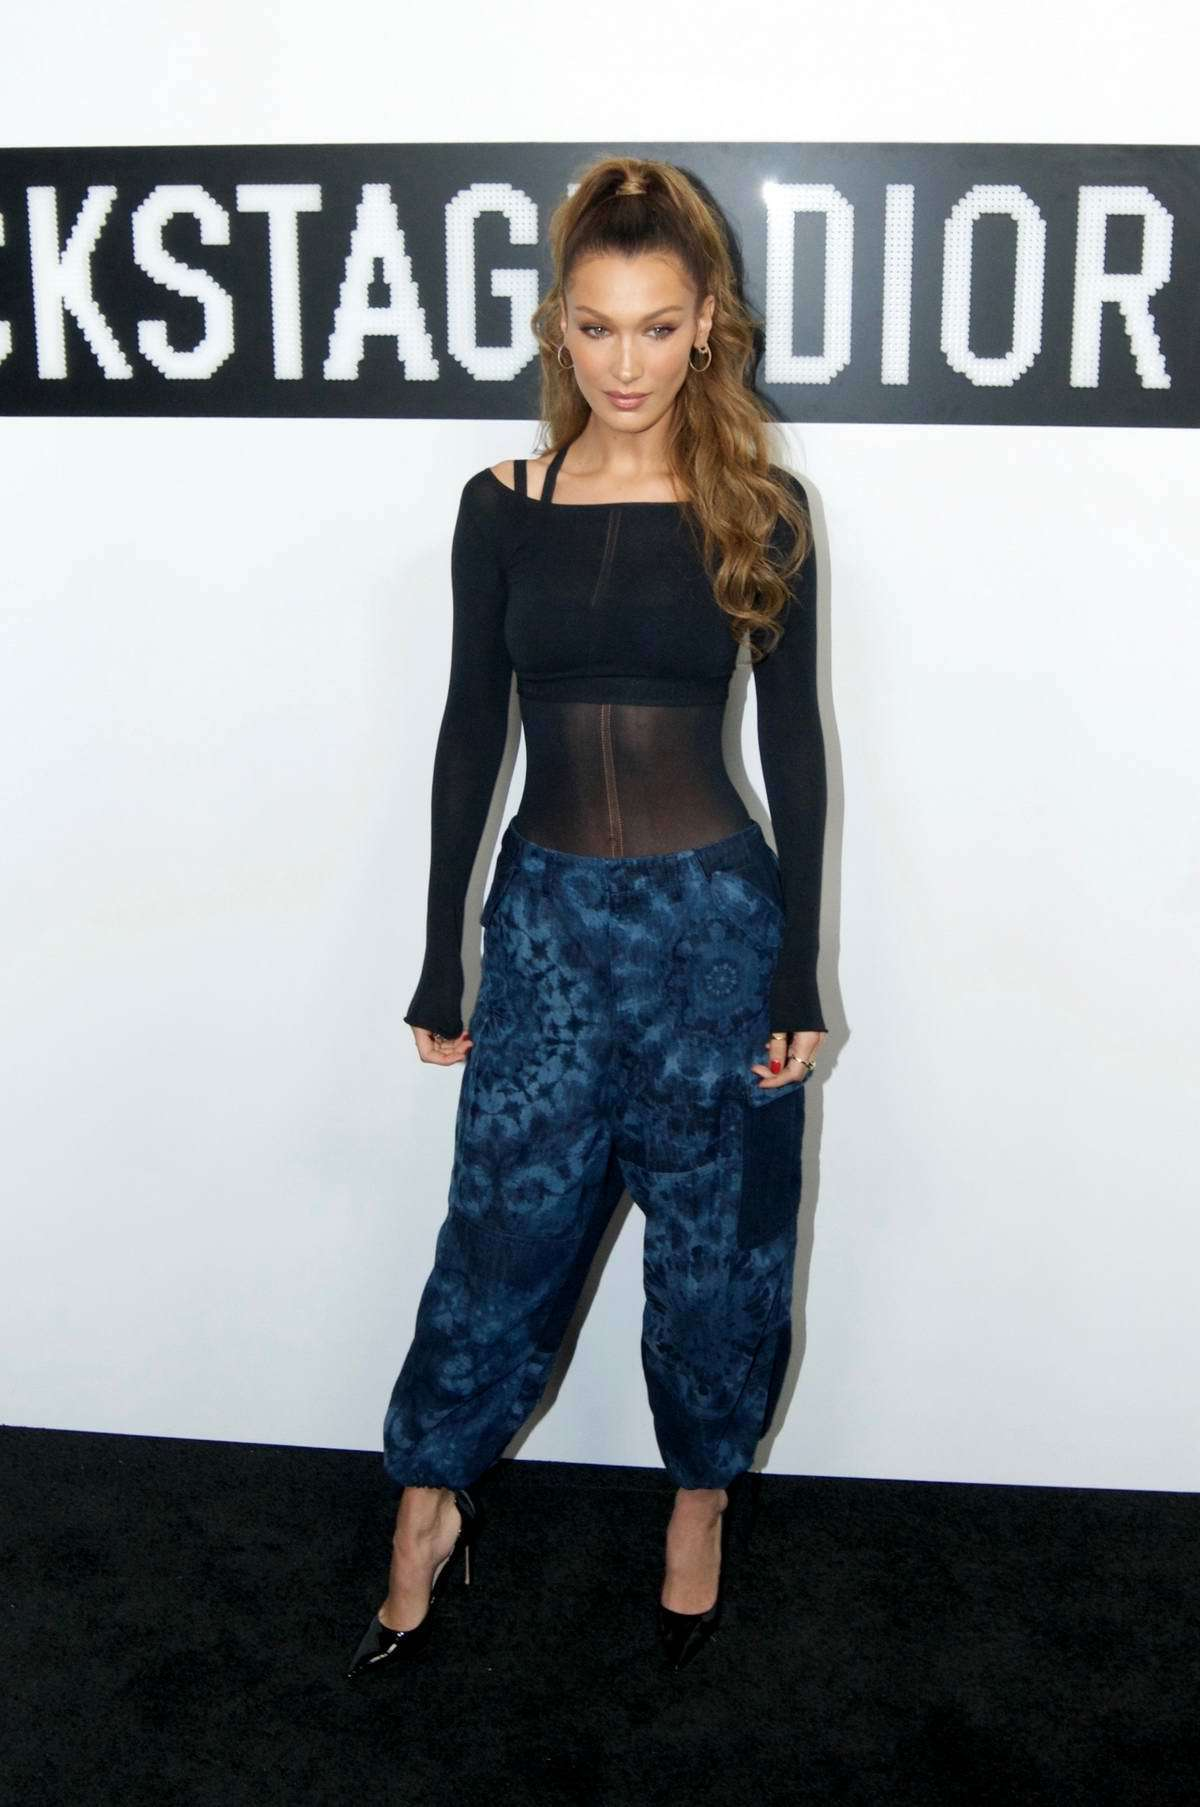 pants sheer top sheer top bella hadid model off-duty celebrity